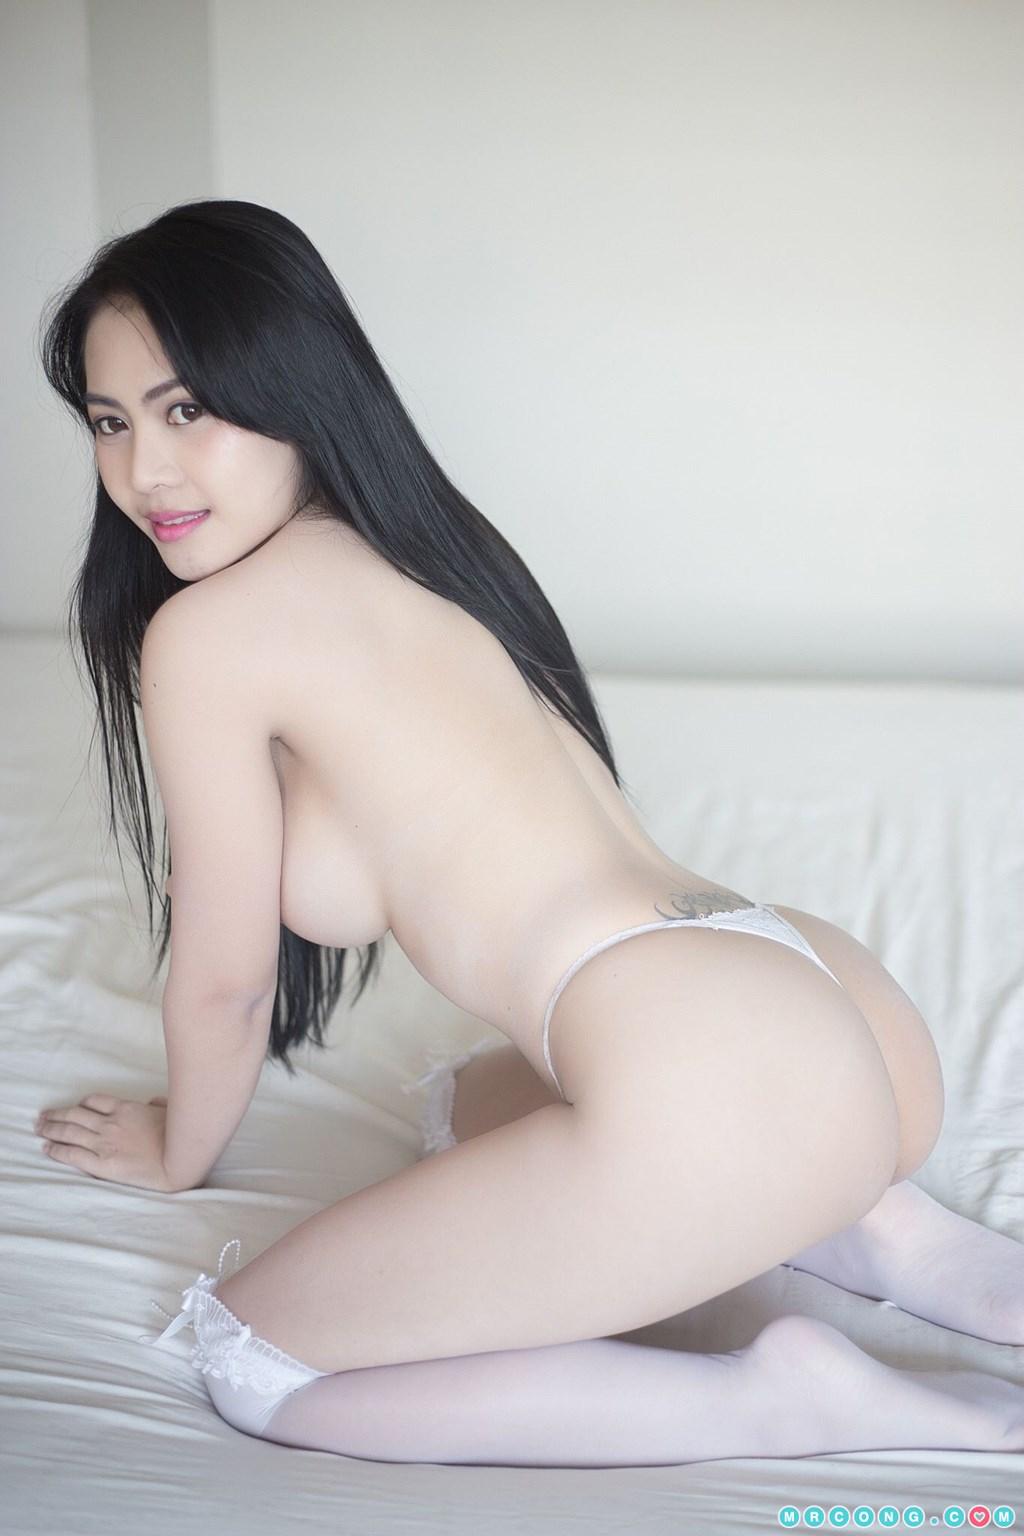 Thai Model No.185: Model เบญจมาศ สุจริต (9 photos)